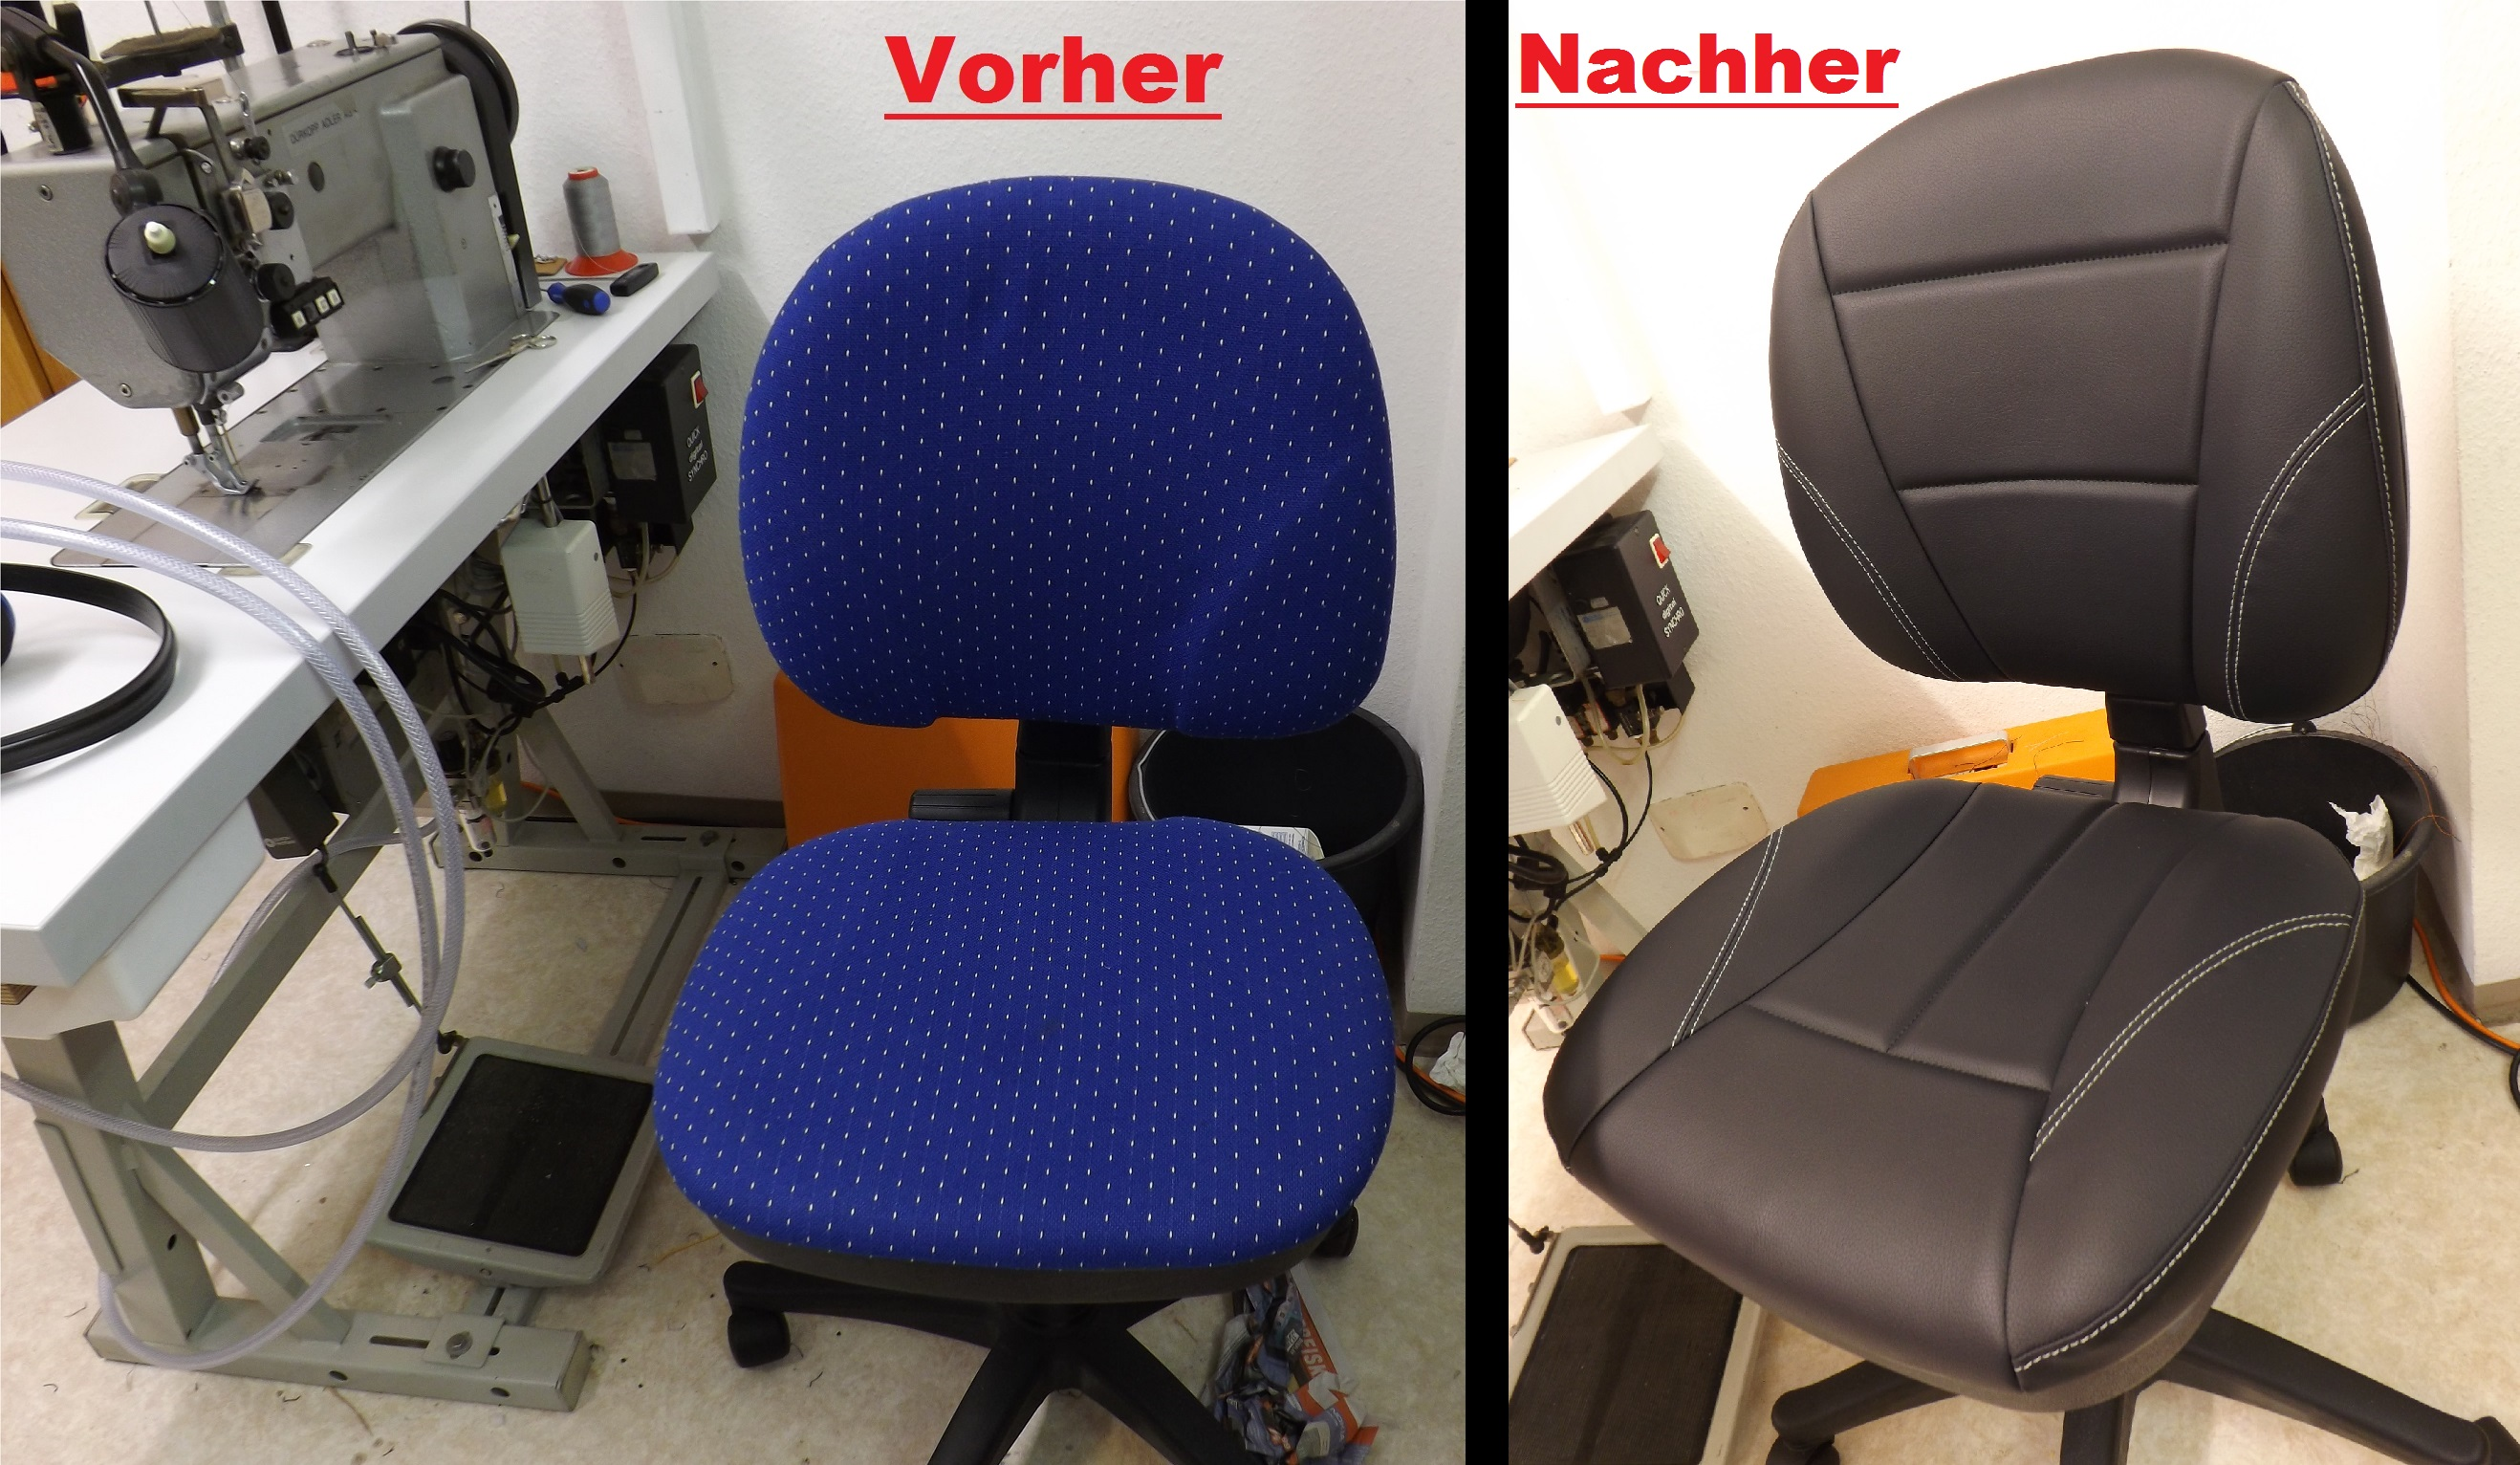 polsterei polsterwerkstatt horb stuttgart leonberg motorradsitzbank und rollersitze oder. Black Bedroom Furniture Sets. Home Design Ideas